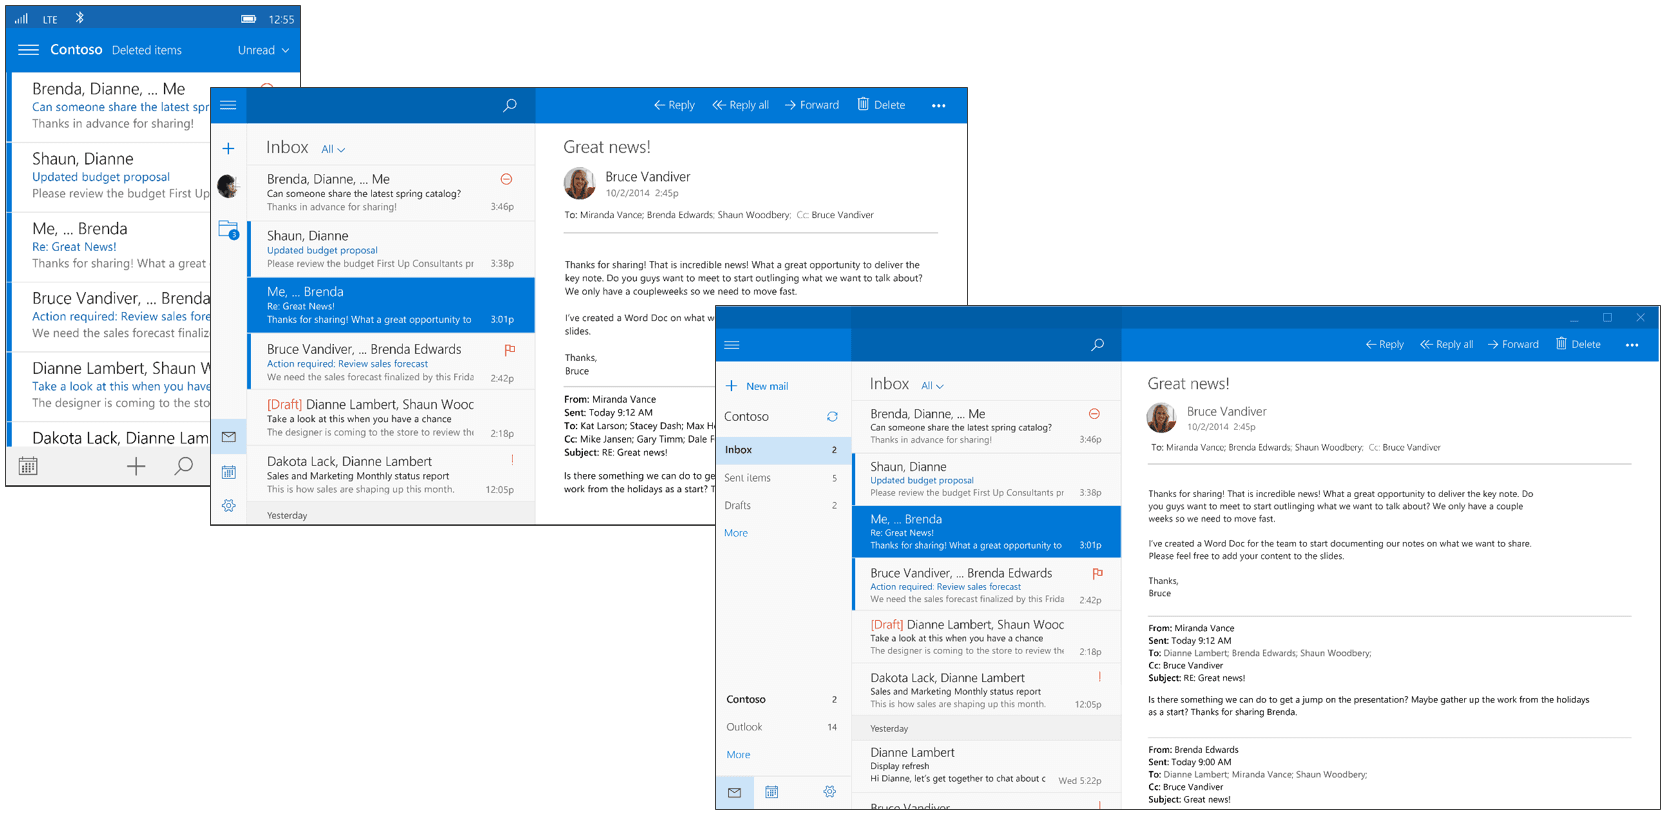 Windows Phone 8.1 kontra Windows 10 Mobile – wzornictwo i interfejs 19